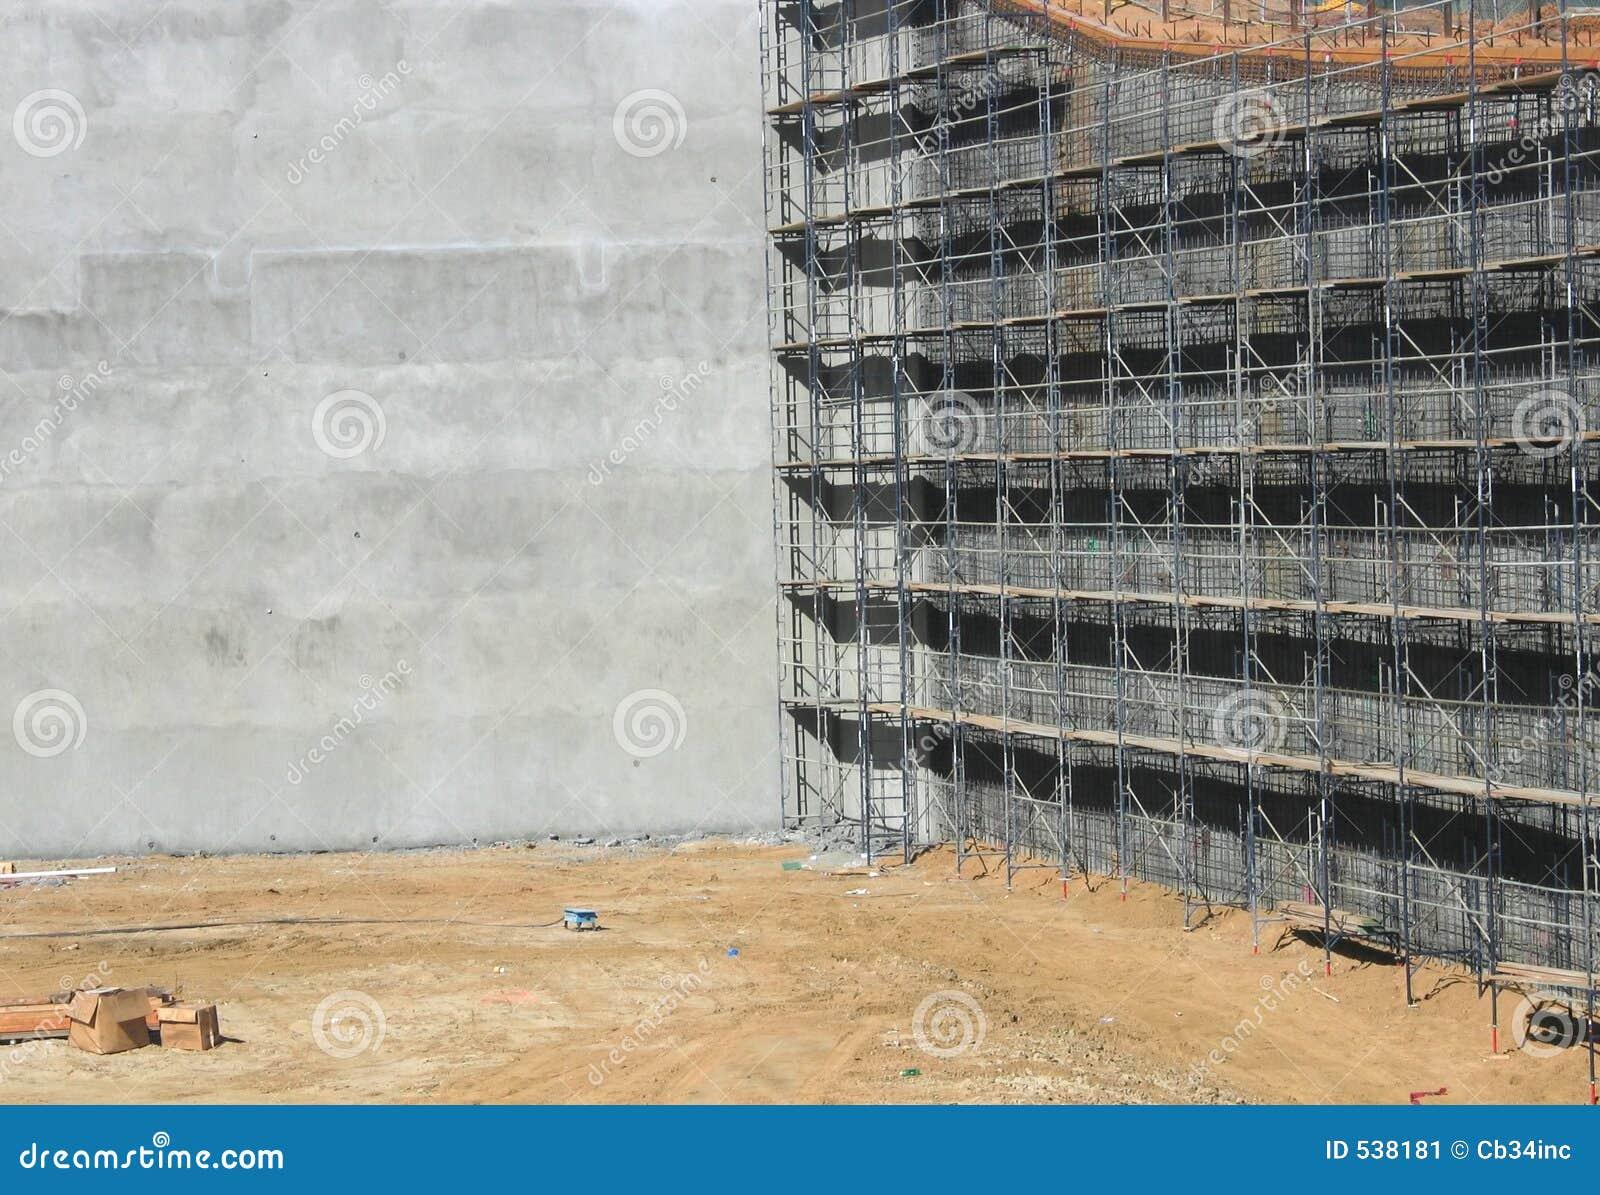 Download 7建造场所 库存图片. 图片 包括有 墙壁, 站点, 工程, 对比, 框架, 编译, 布琼布拉, browne - 538181